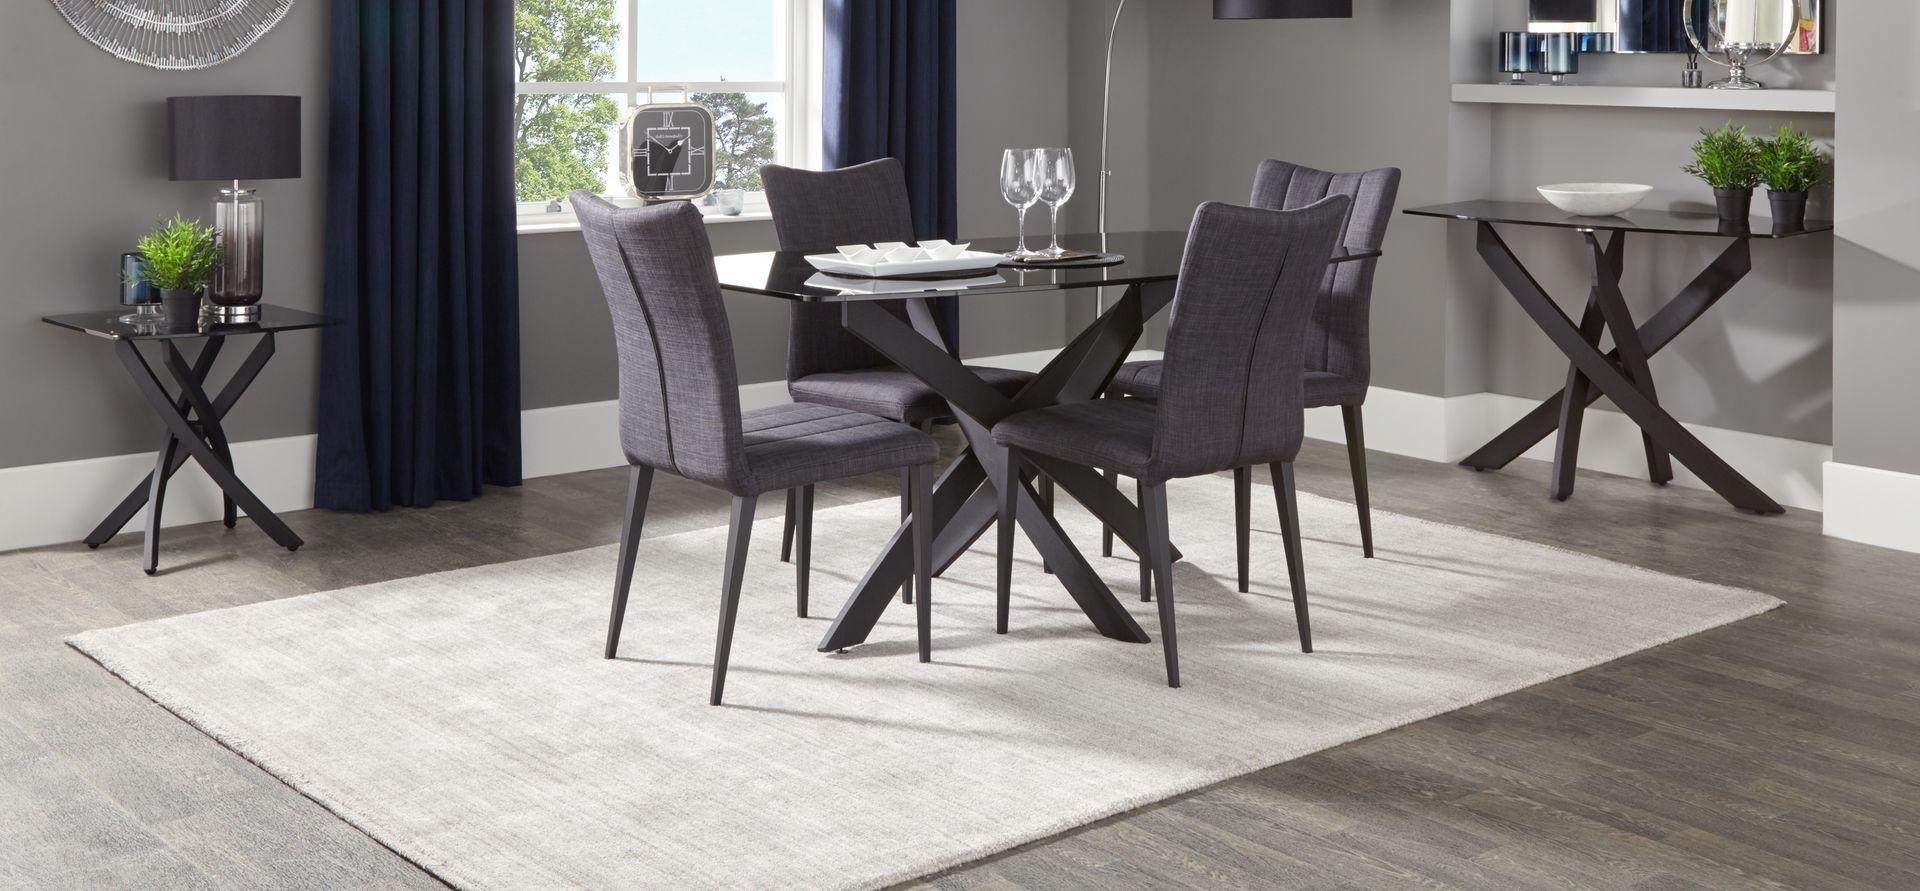 Scs Dining Room Furniture – Cheekybeaglestudios For Most Popular Scs Dining Room Furniture (View 17 of 25)